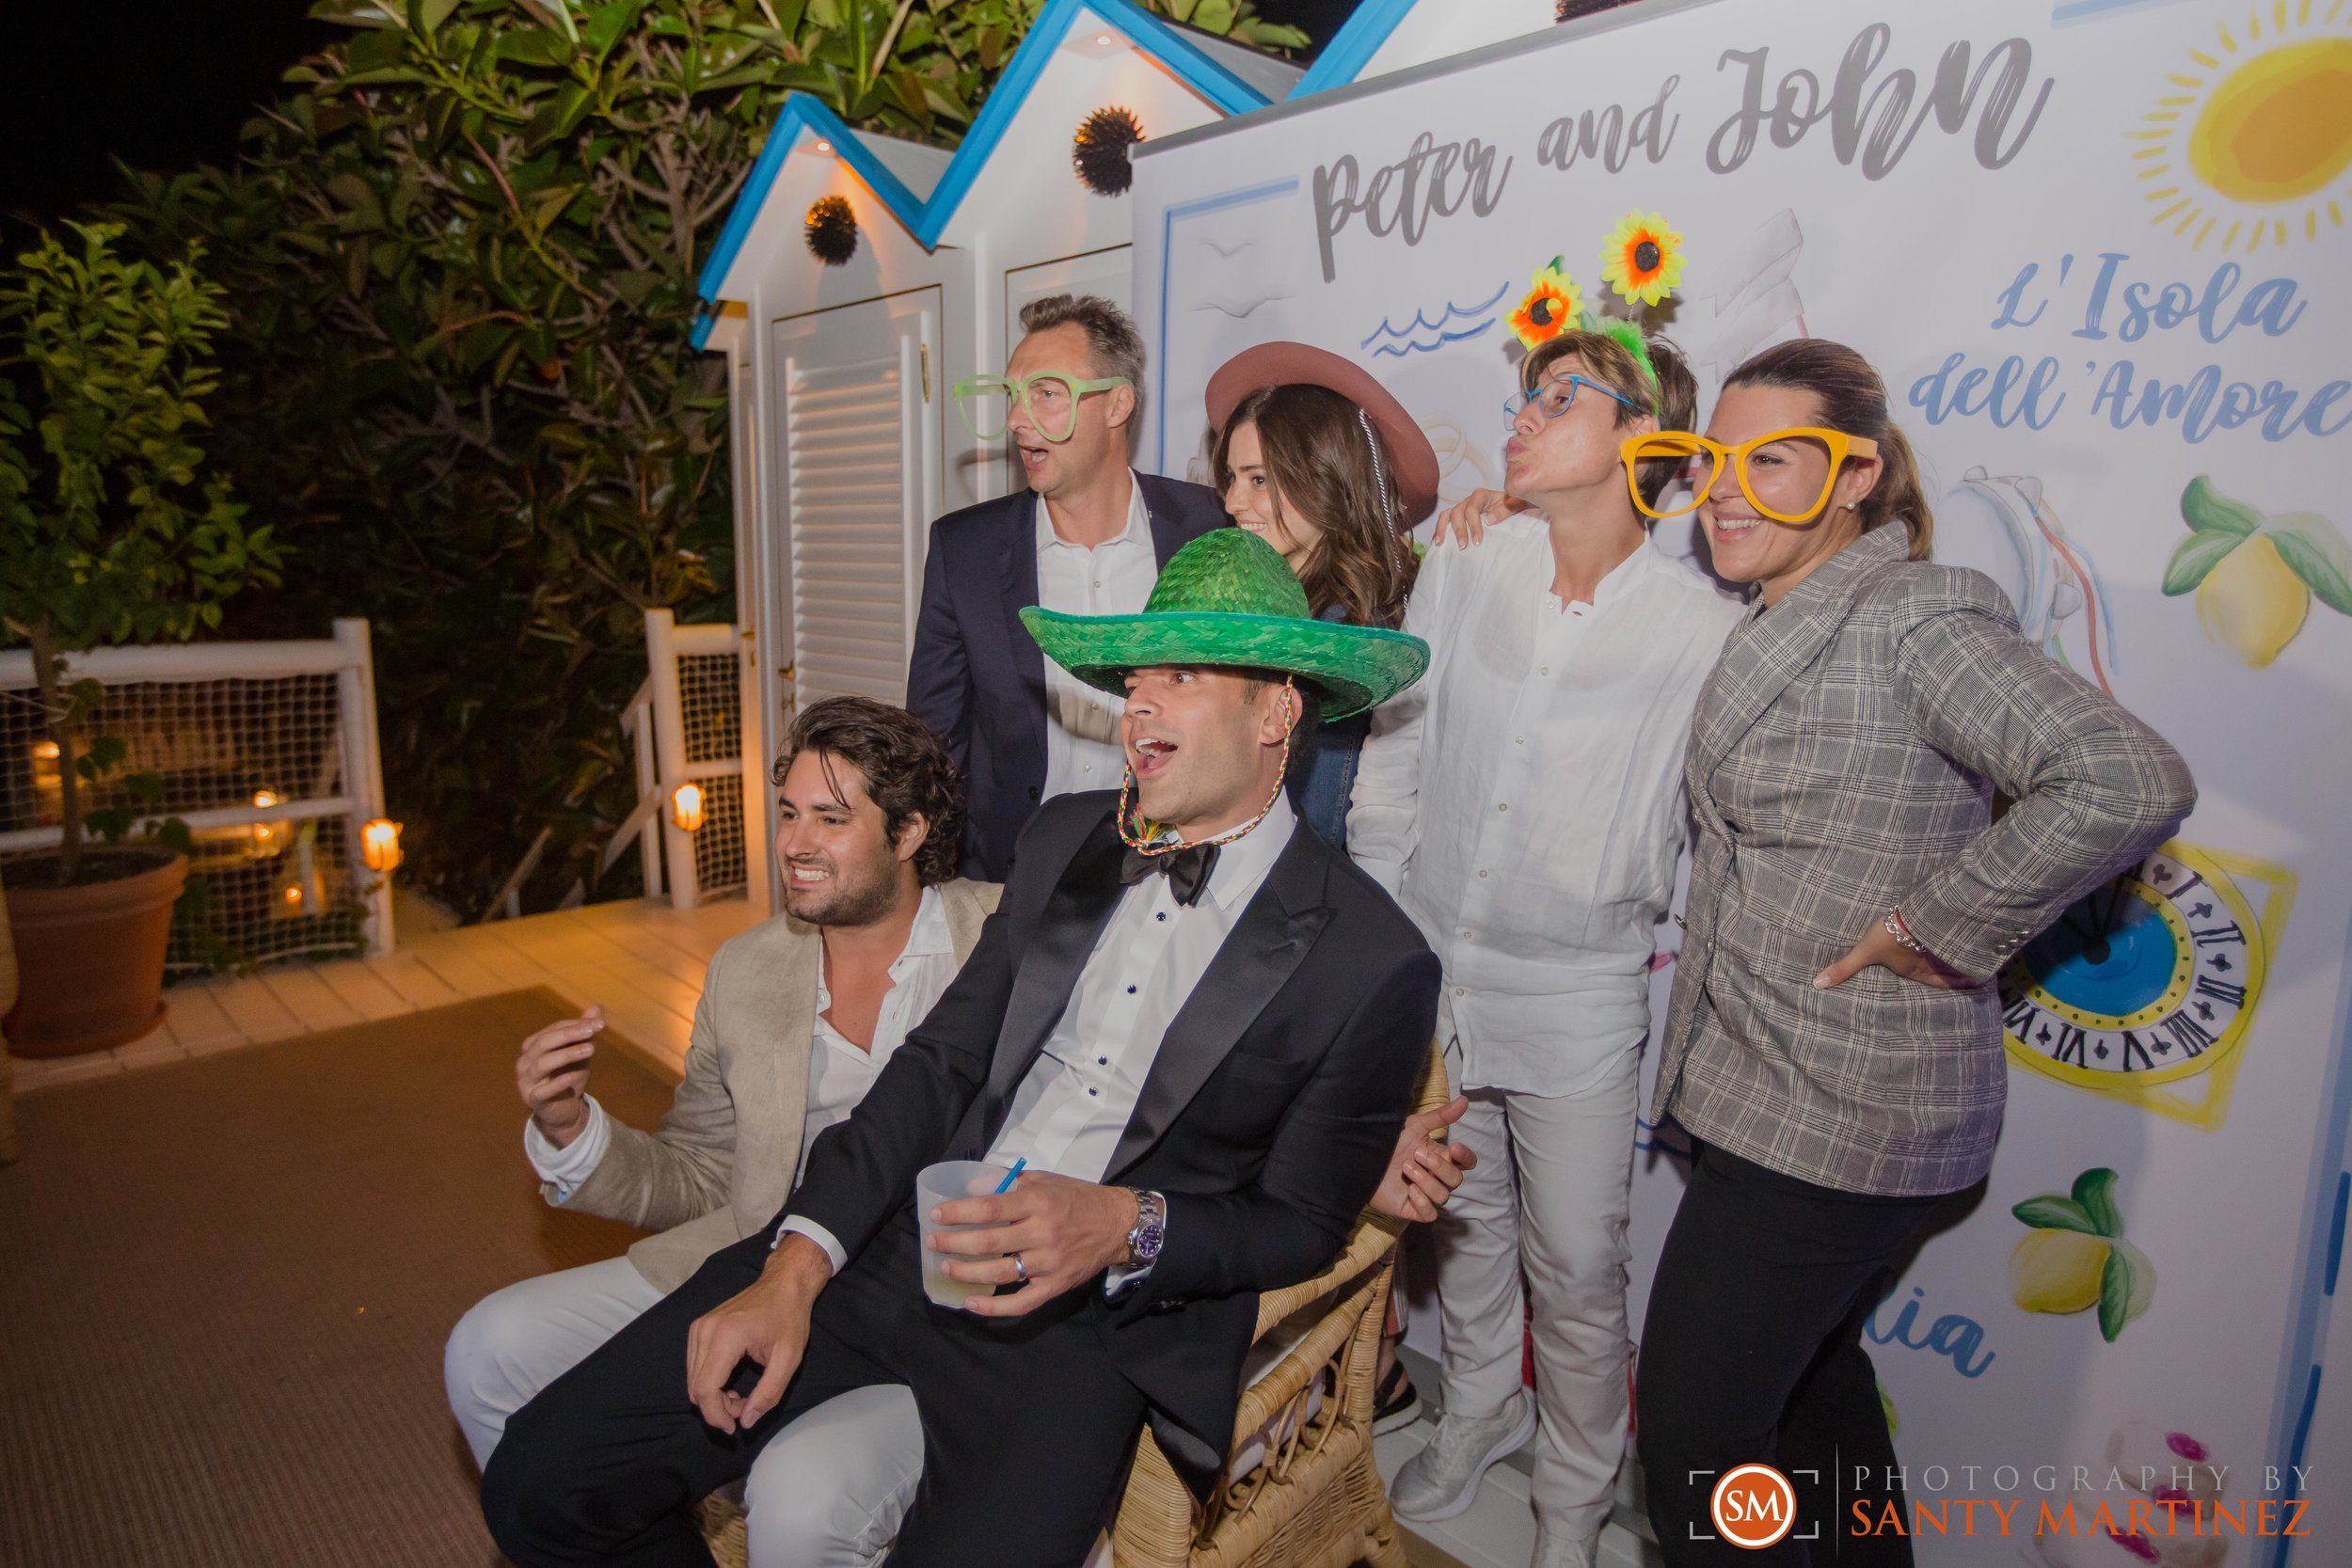 Wedding Capri Italy - Photography by Santy Martinez-84.jpg